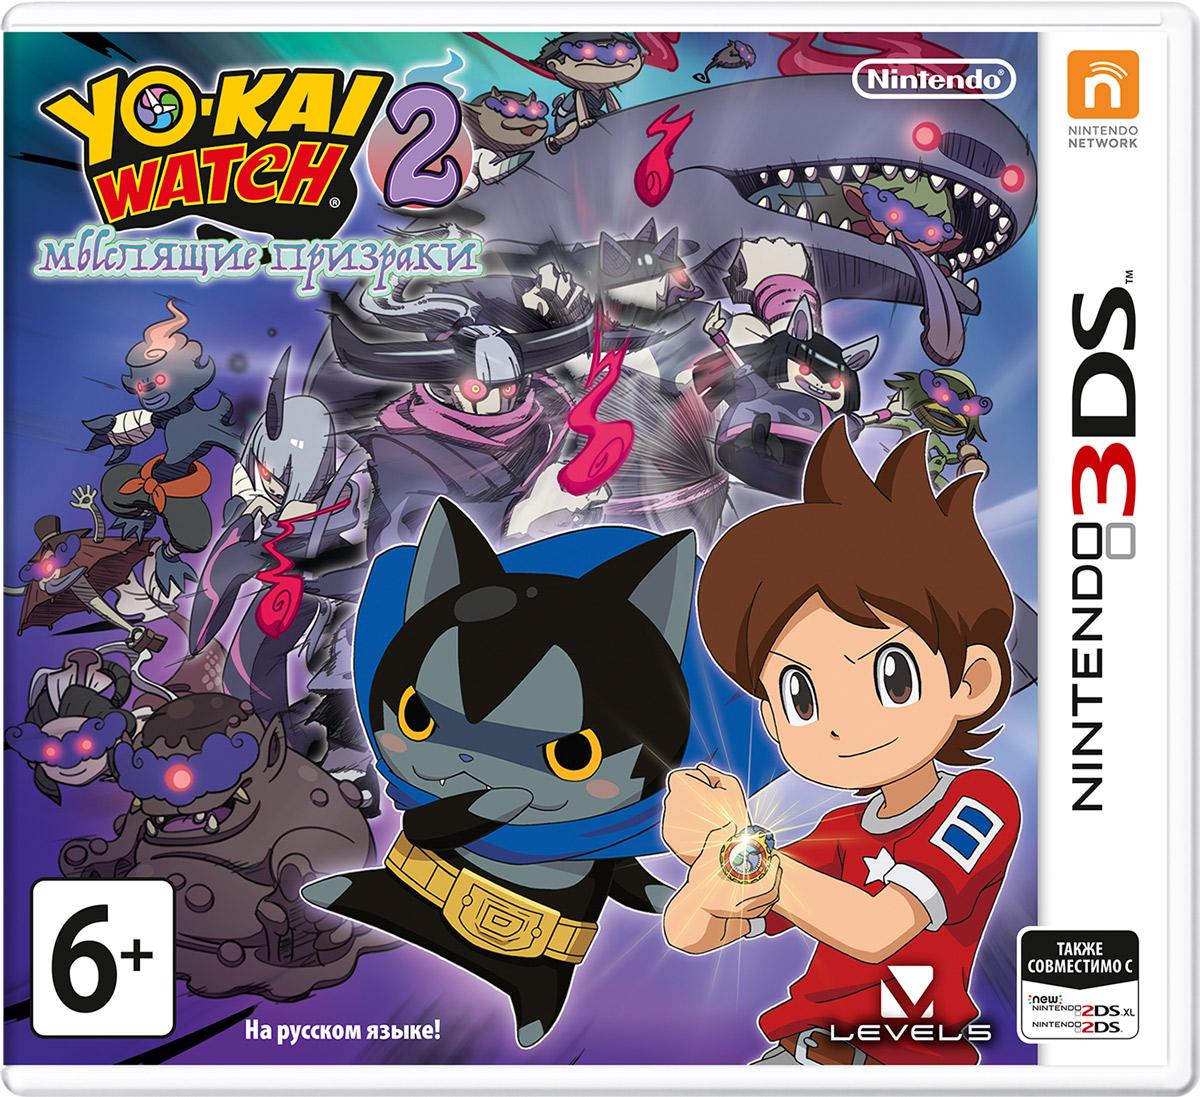 YO-KAI WATCH 2: Мыслящие призраки (3DS) цена